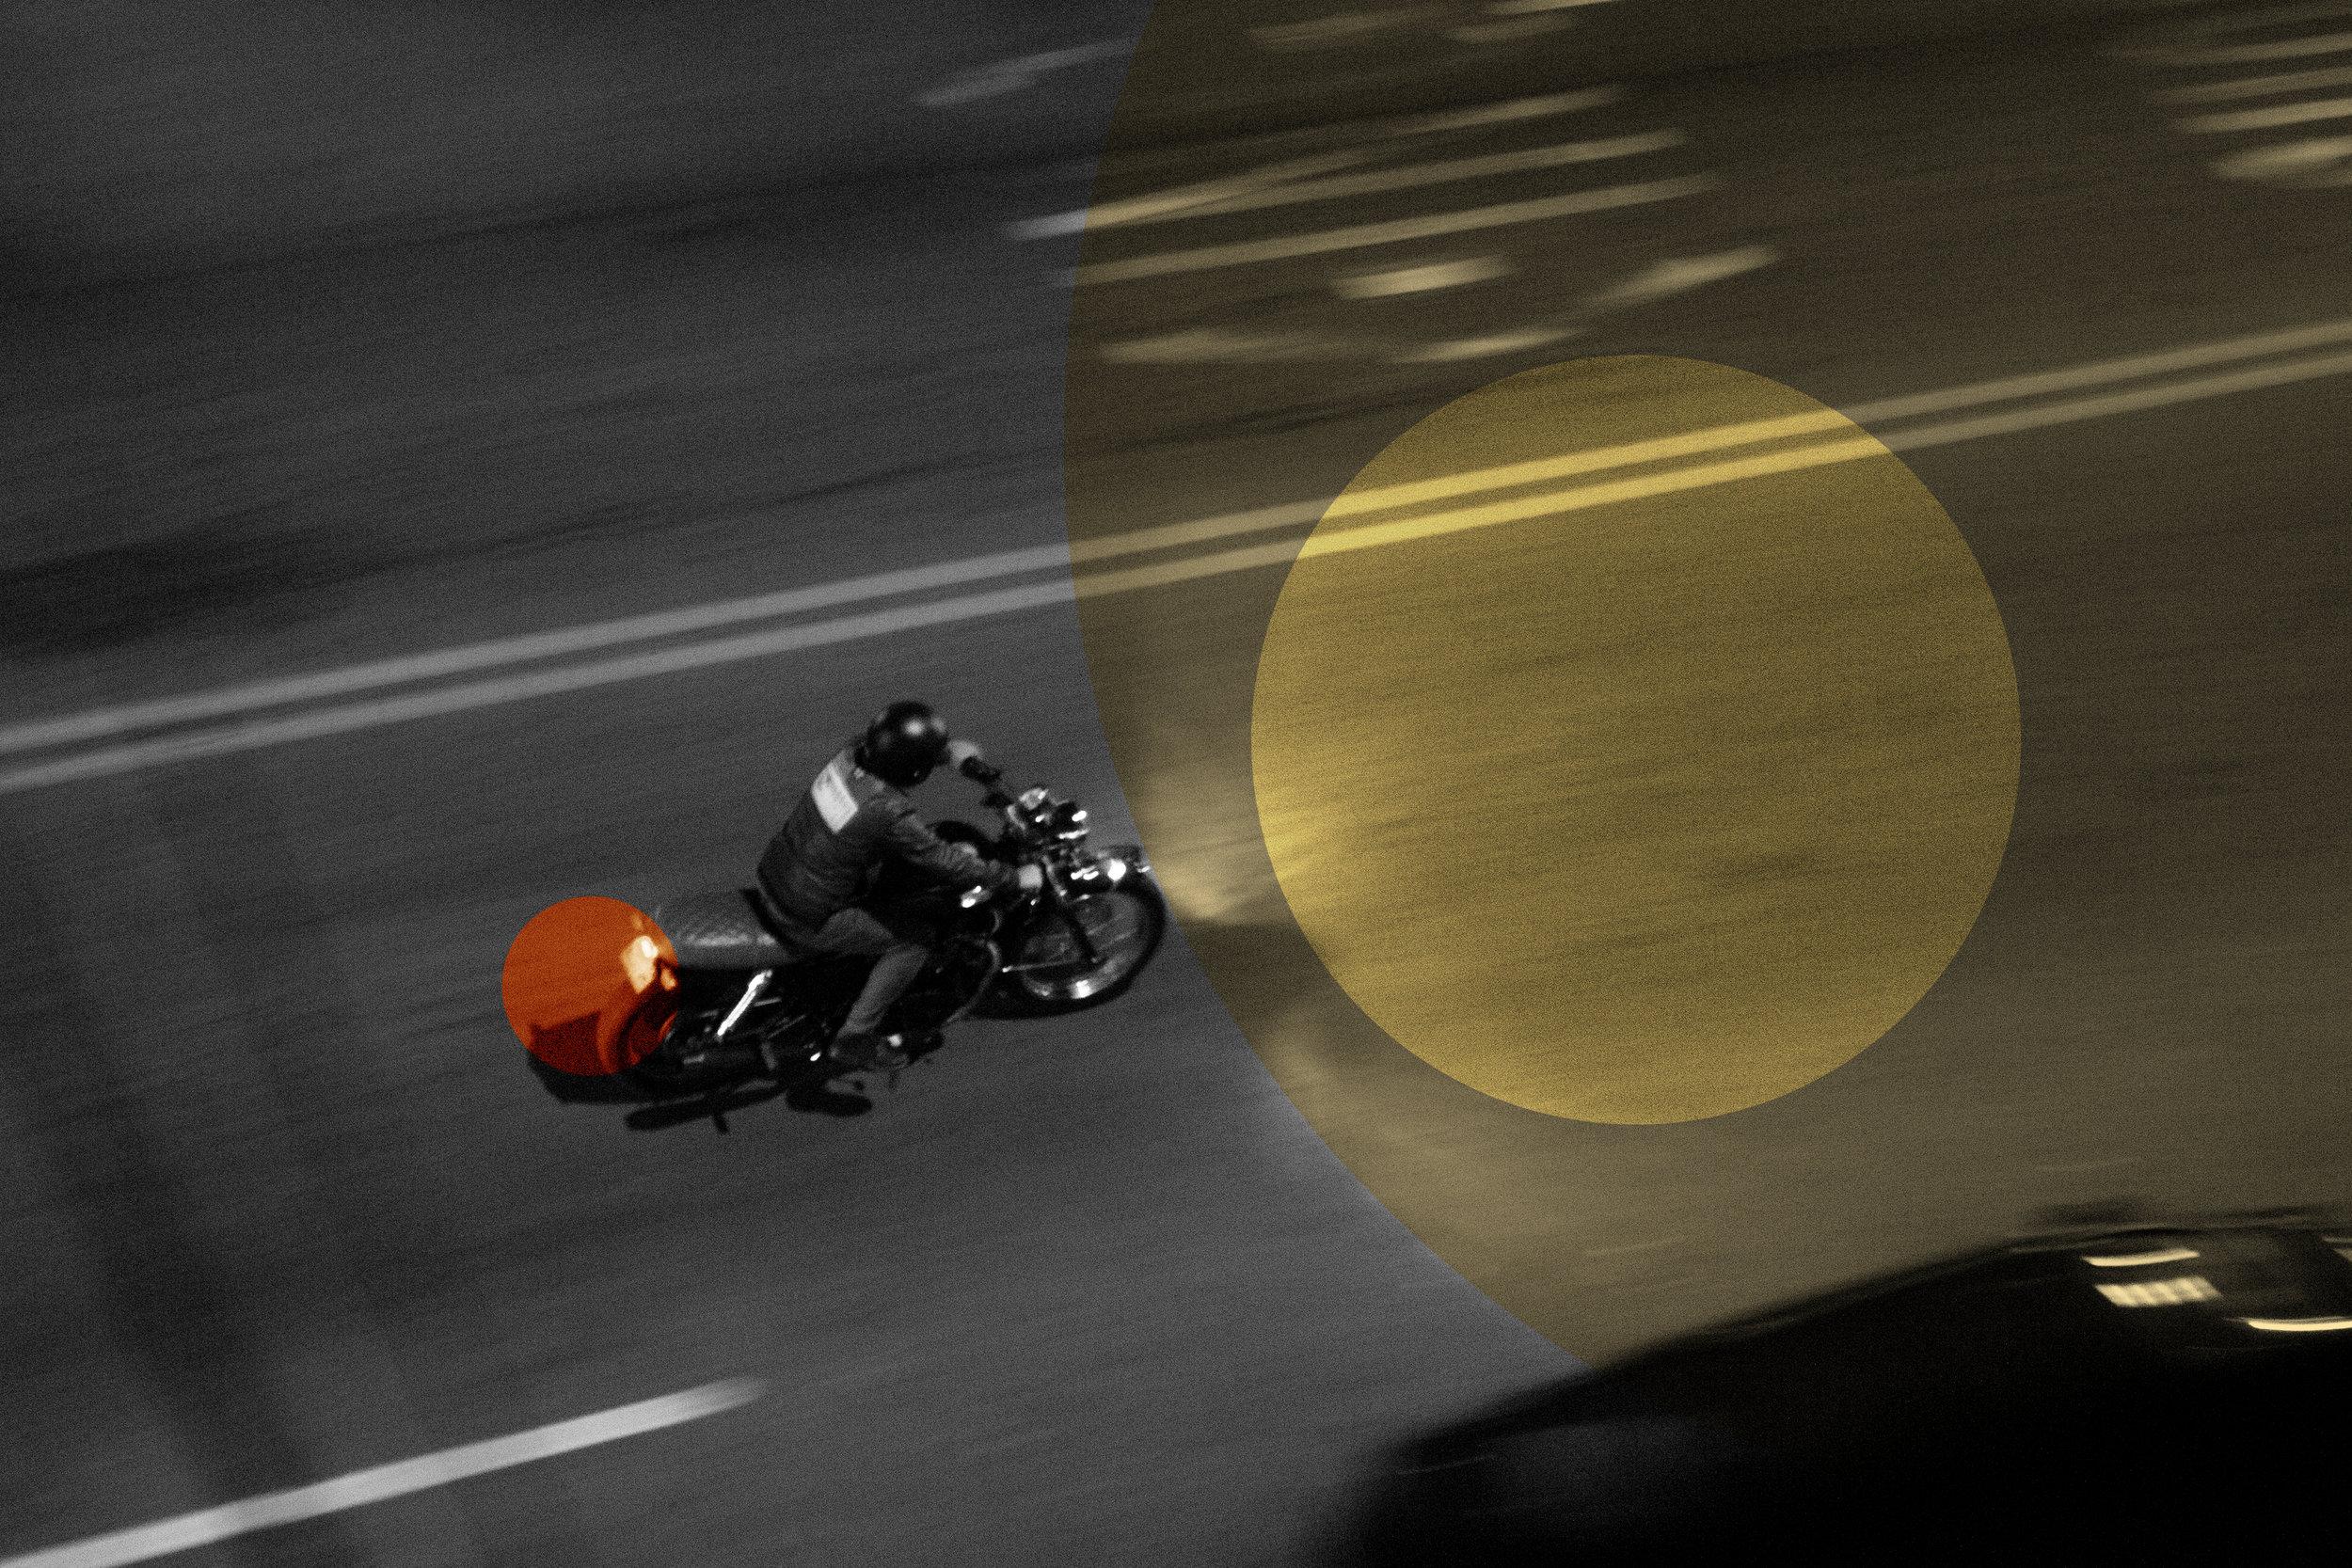 Moto.jpg